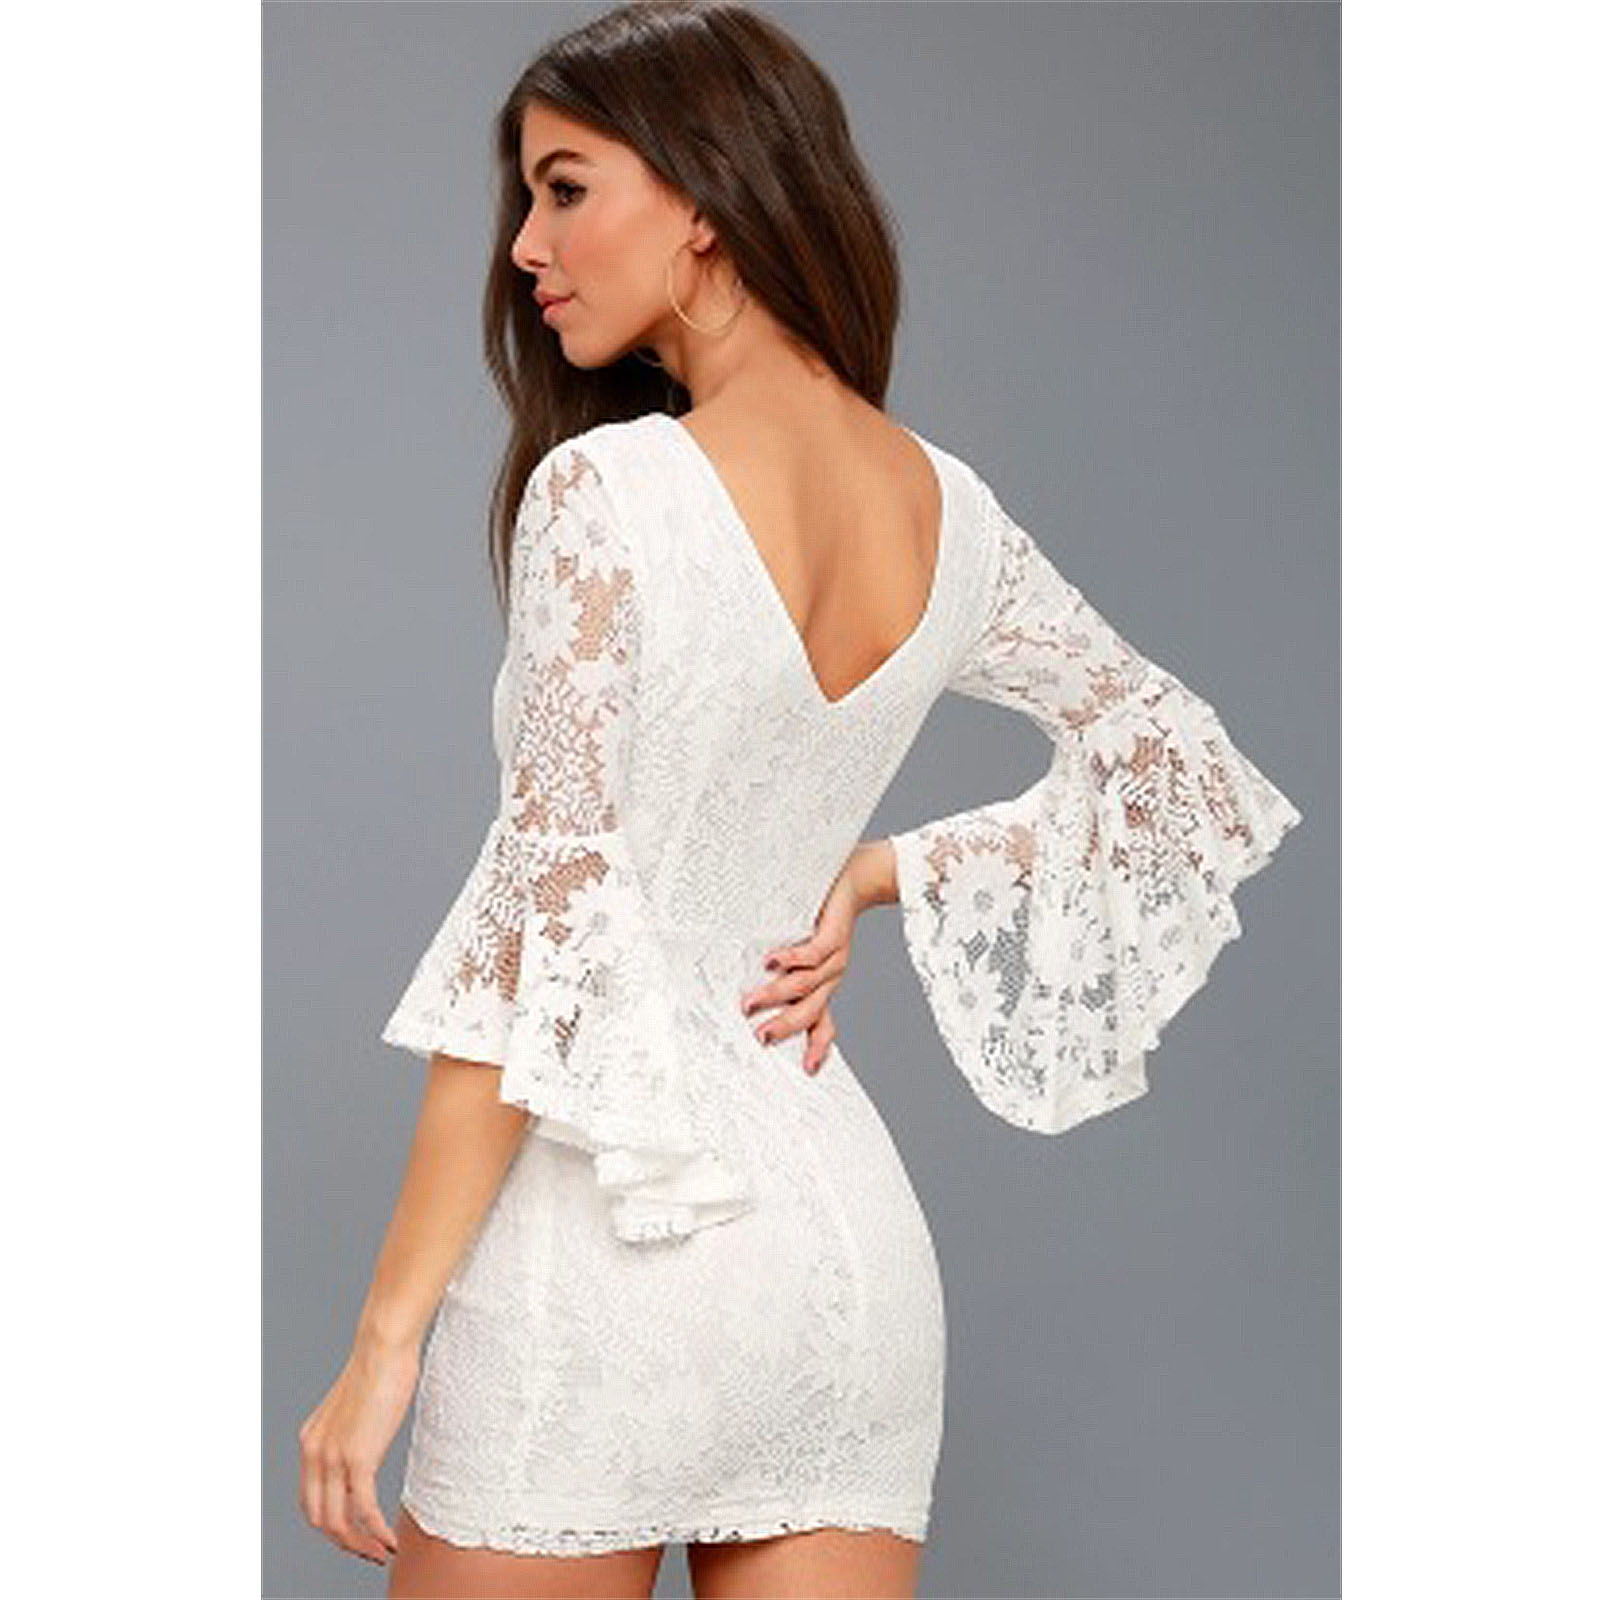 ee116f8c8b56 Women Floral Bustier Clubwear Party Bell Sleeve Lace Bodycon Mini ...